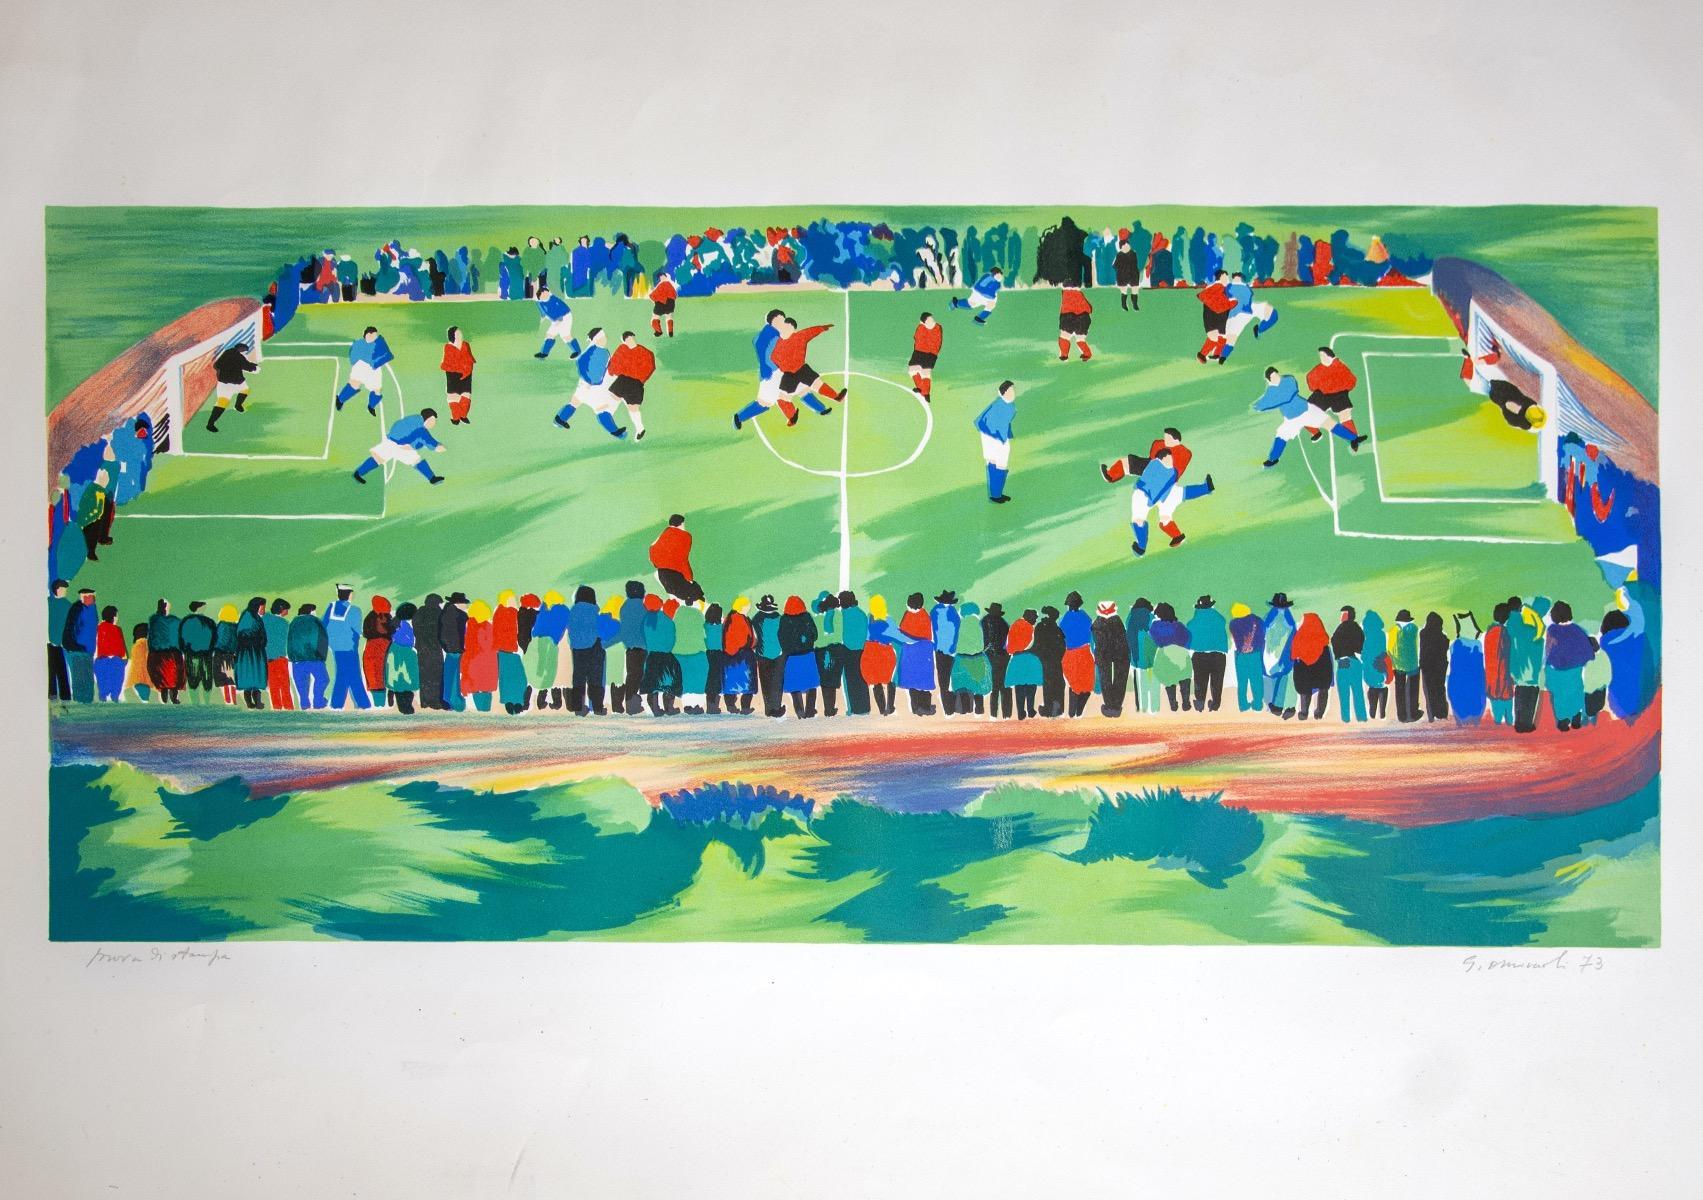 Football Match - Original Lithograph by Giovanni Omiccioli - 1973